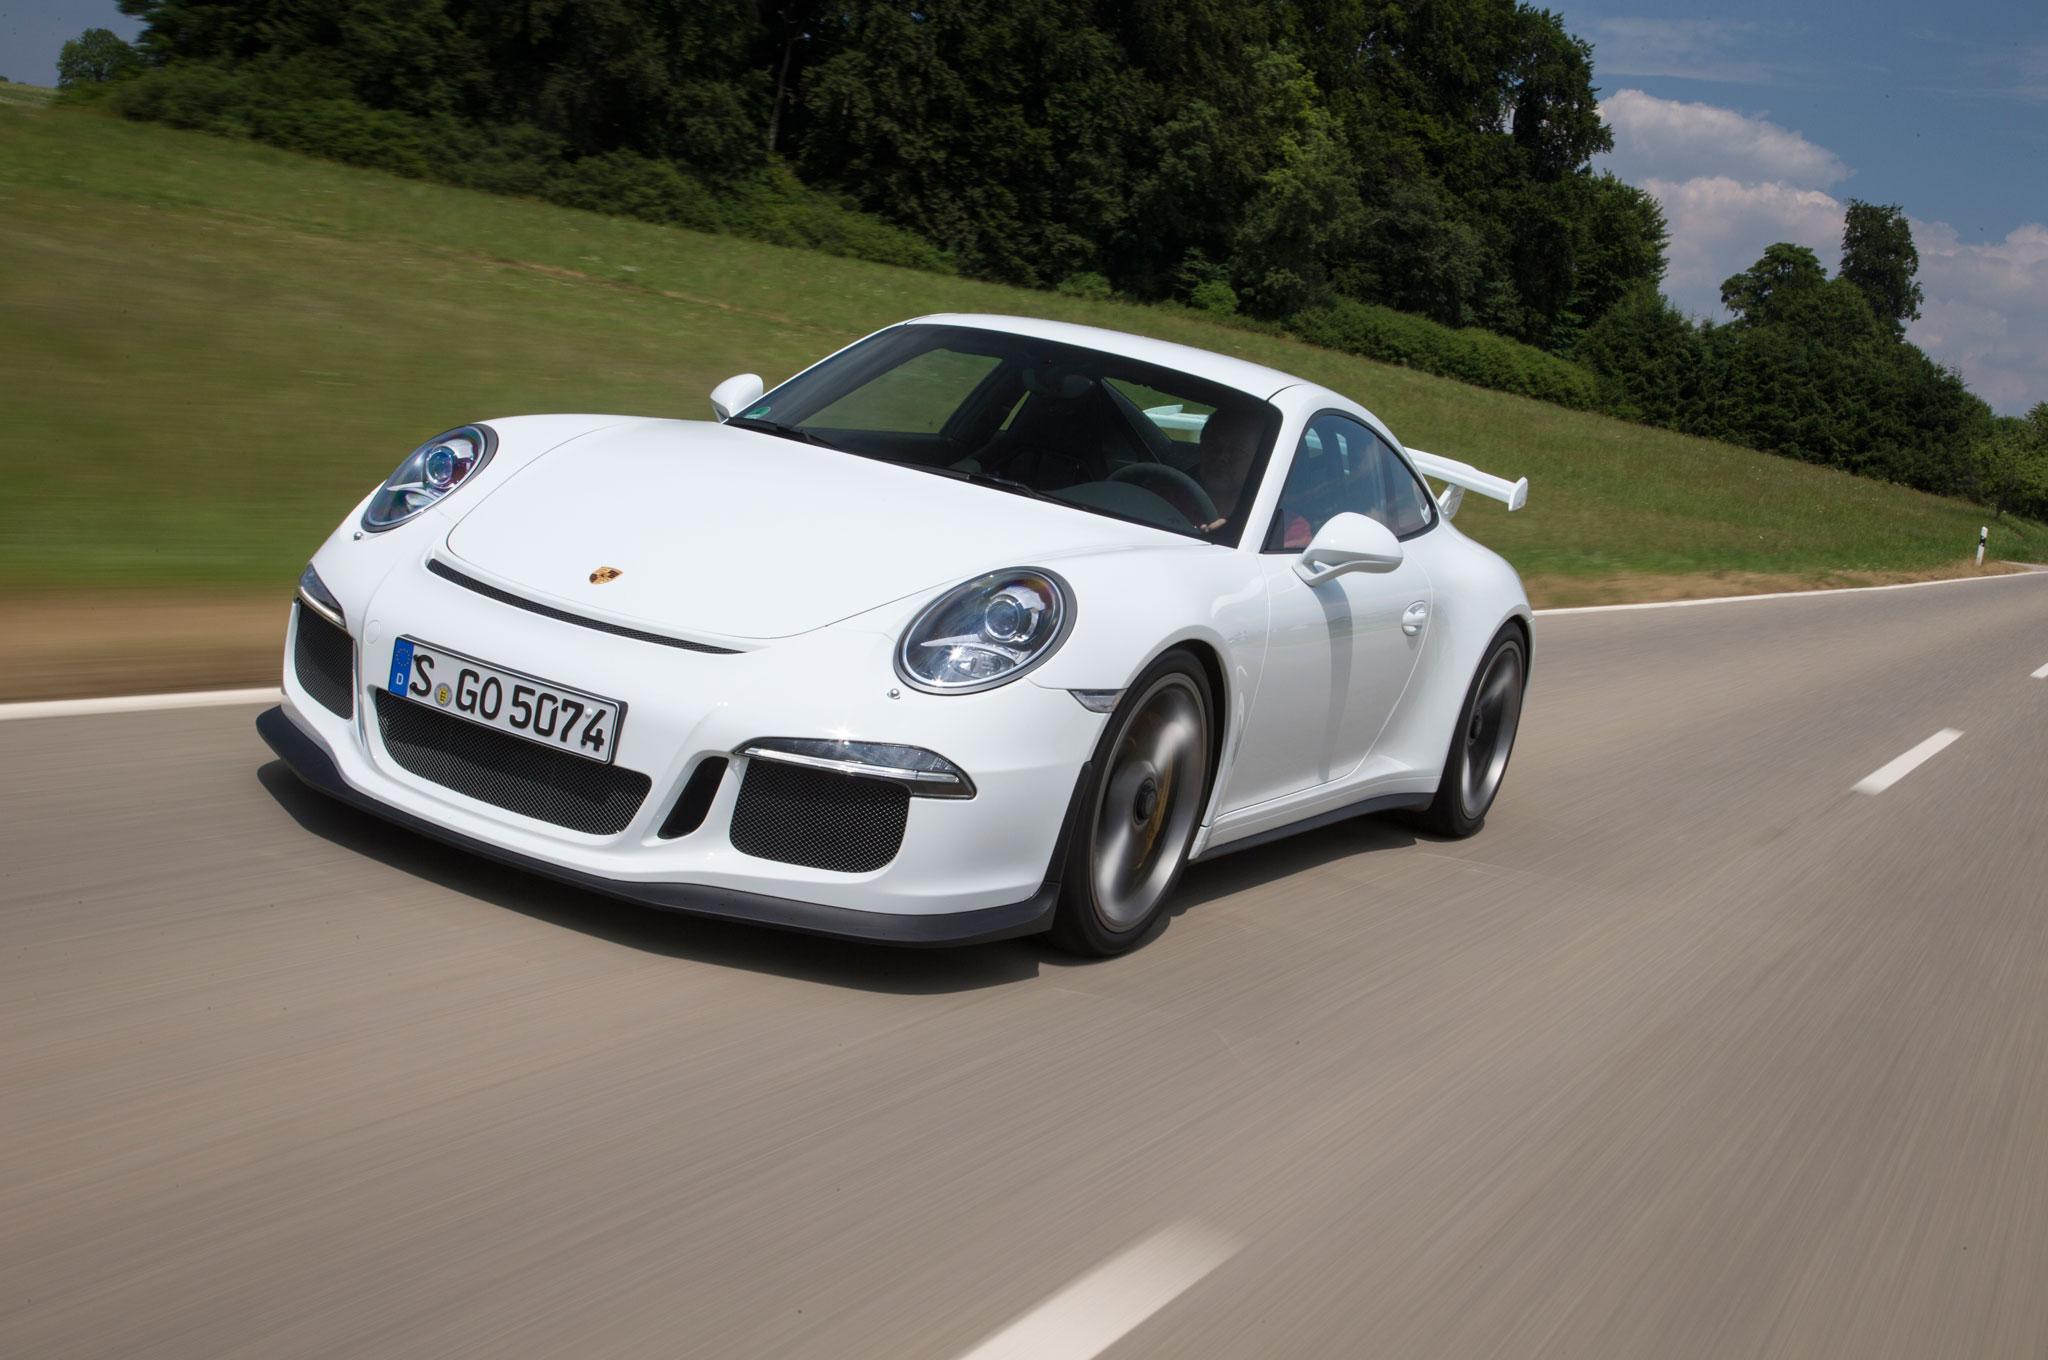 2014 porsche 911 targa review automobile magazine rh automobilemag com 2013 porsche 911 manual 2014 porsche 911 turbo manual